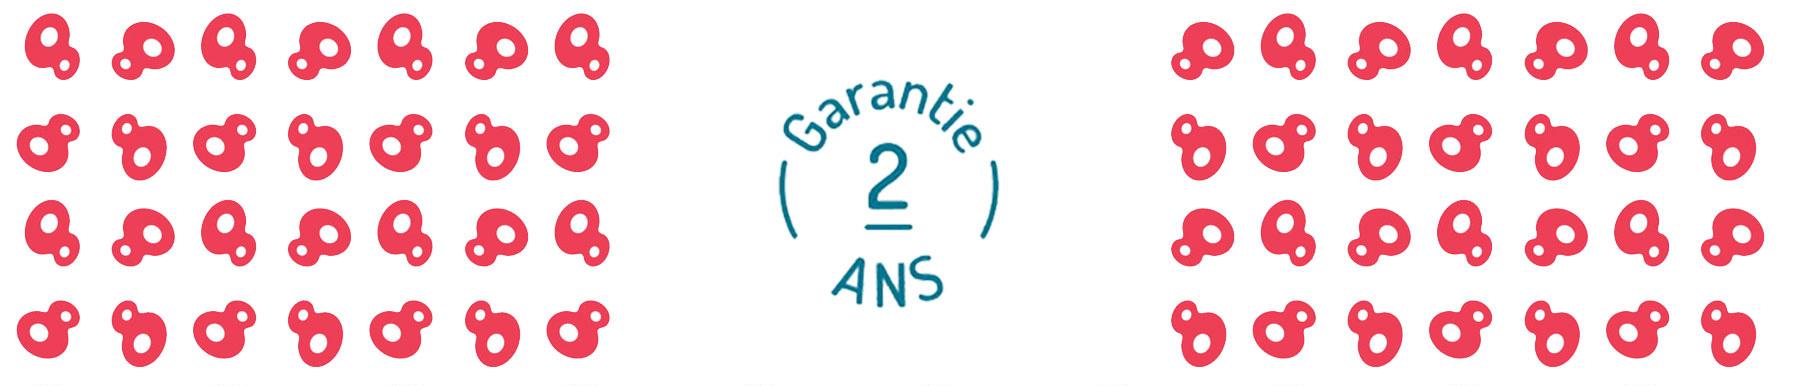 garantie_2ans_1.jpg